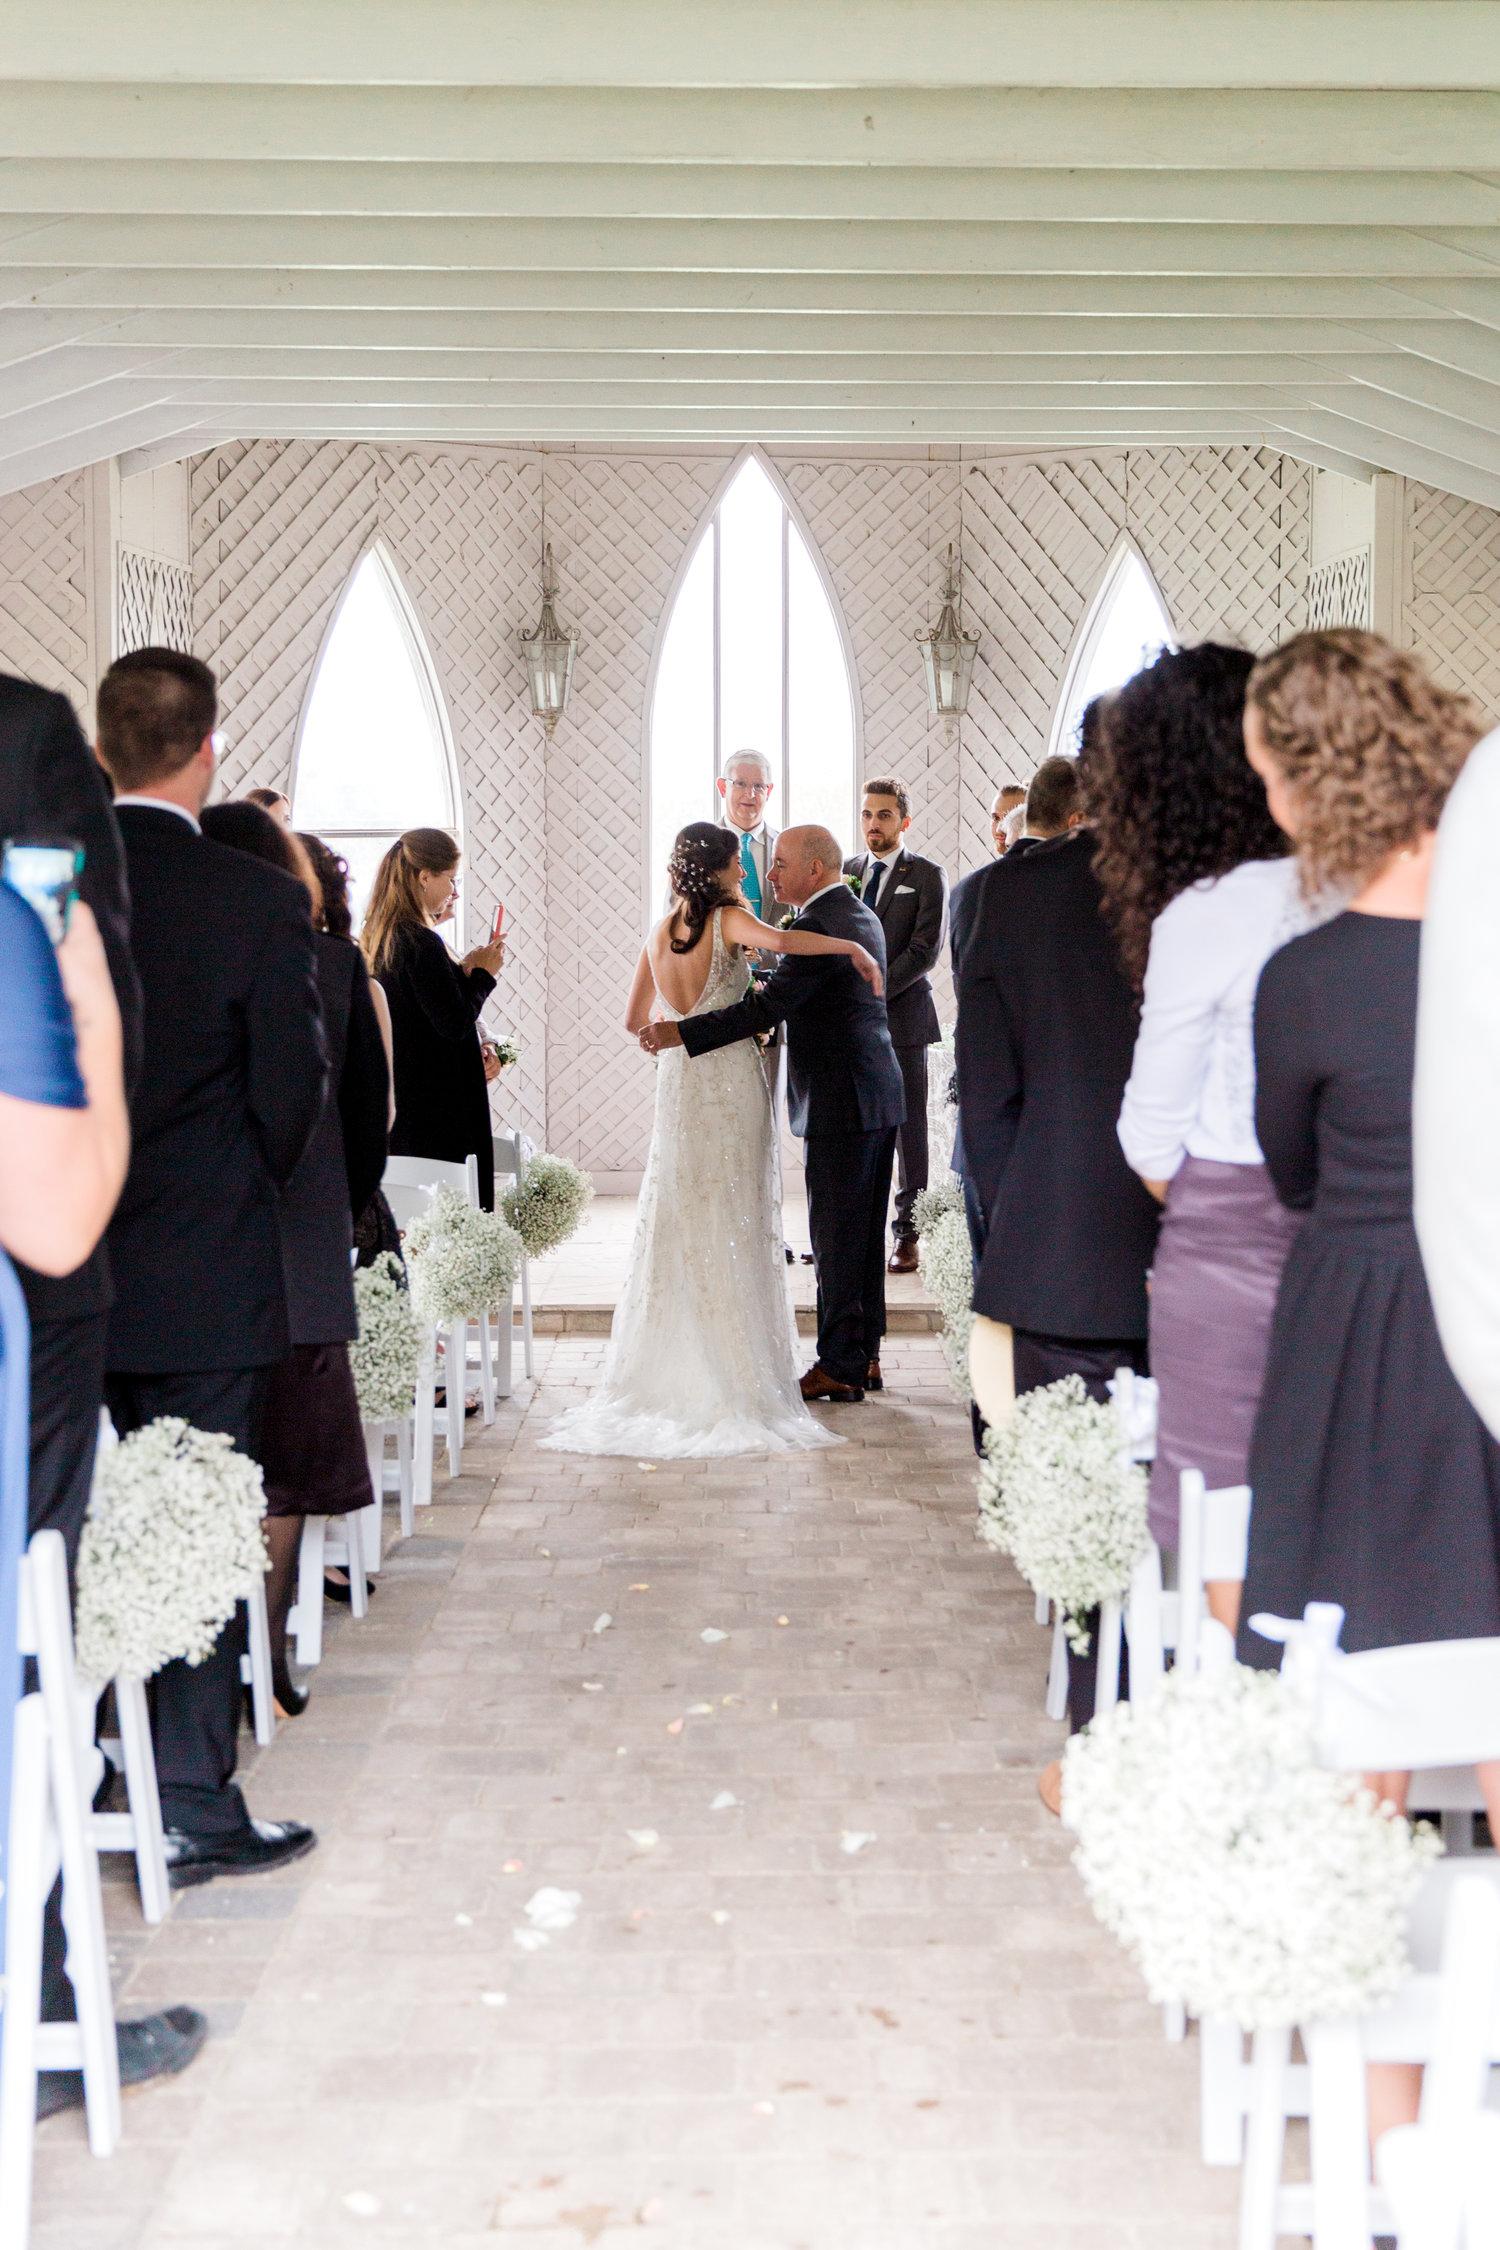 Amir-Golbazi-Danielle-Giroux-Photography_Toronto-Wedding_Cedarwood_Rachel-Paul_169.jpg